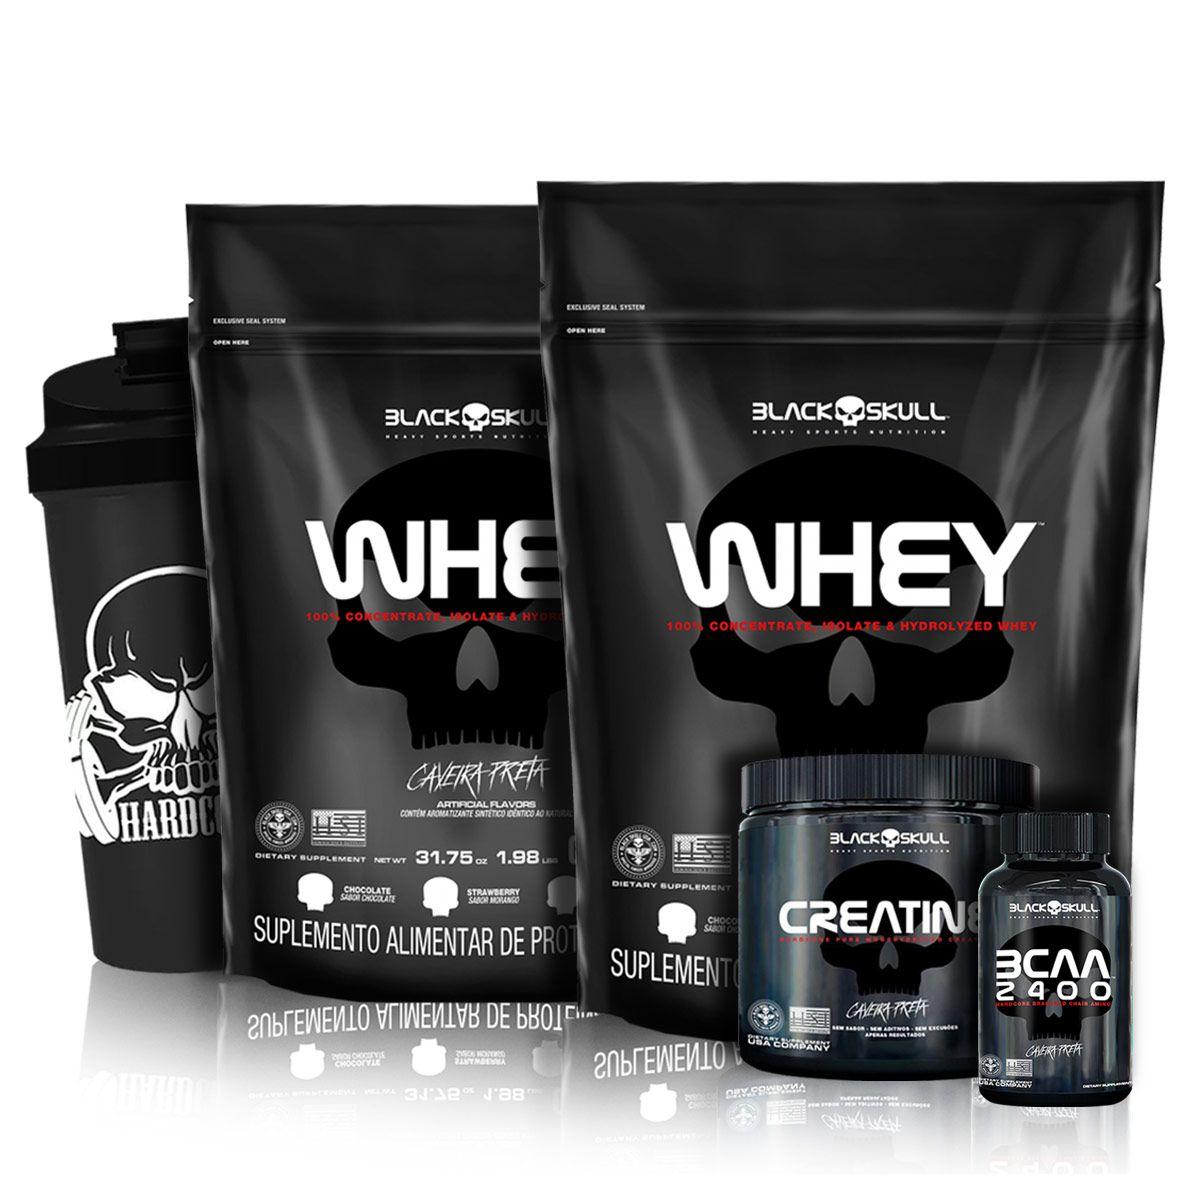 Kit 2x Whey Protein Refil 900g - Black Skull